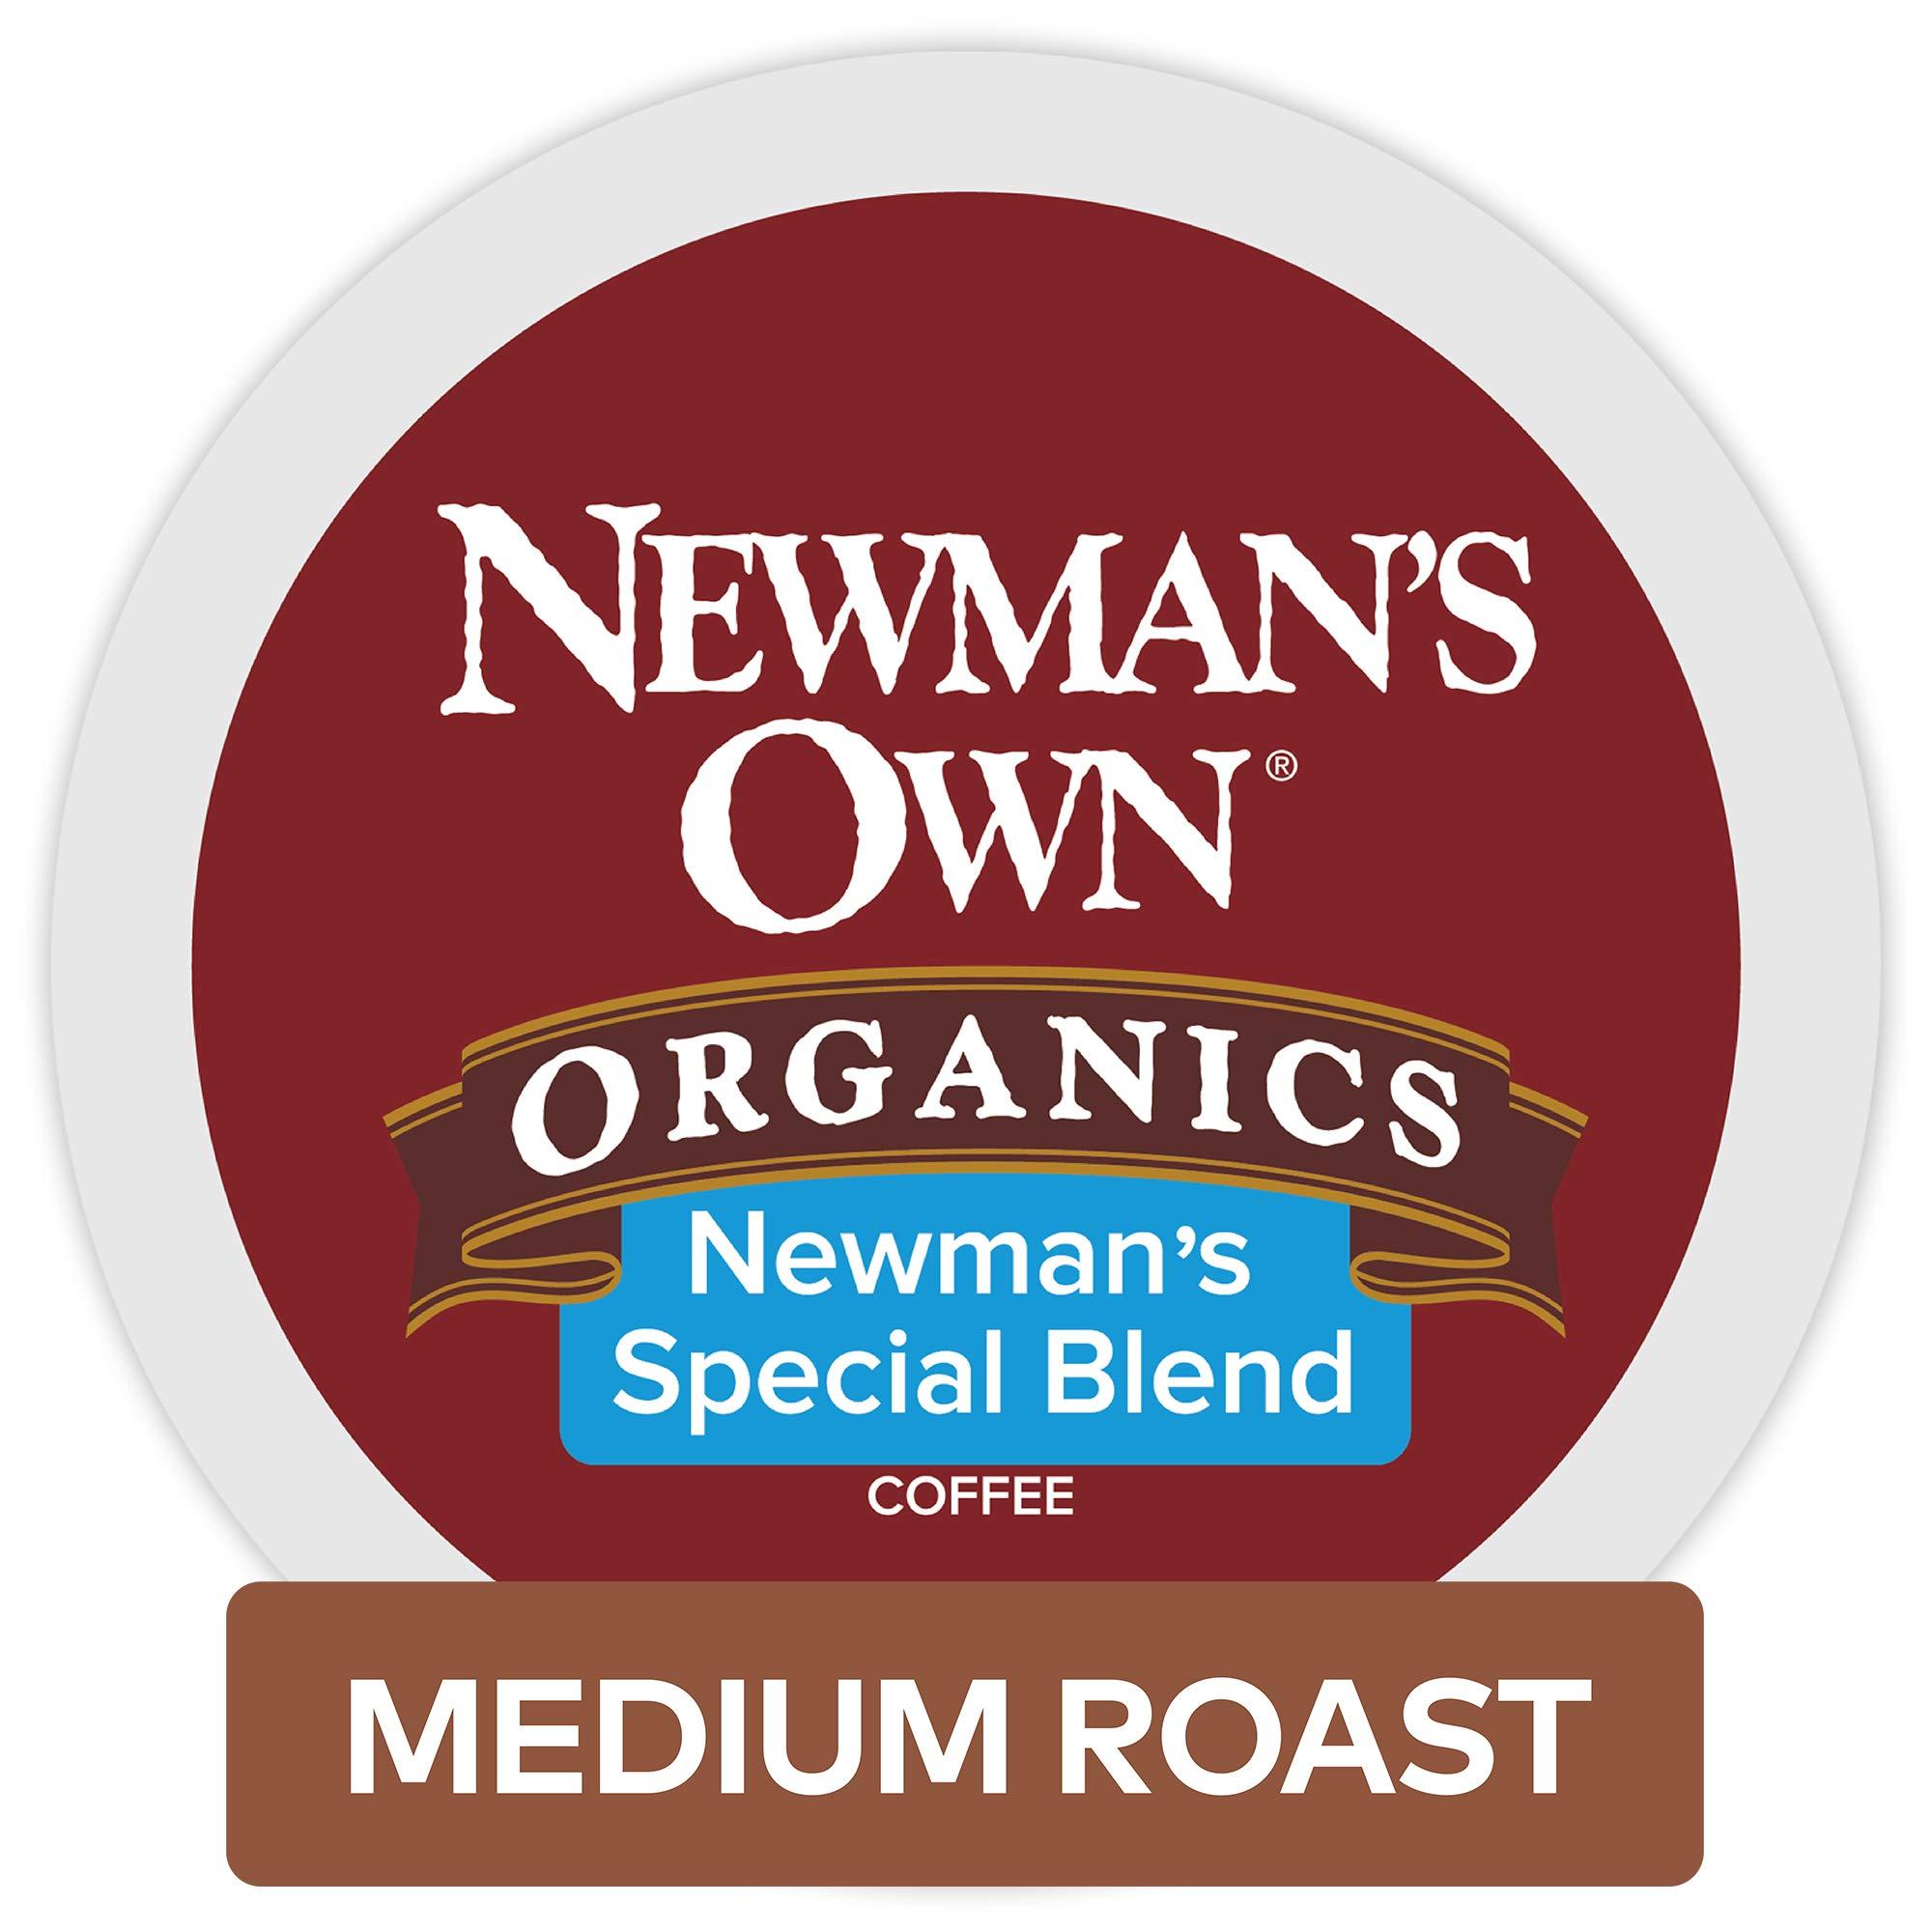 Newman's Own Organics Special Blend Keurig Single-Serve Medium Roast Coffee K-Cup Pods, 32 Count by Newman's Own Organics